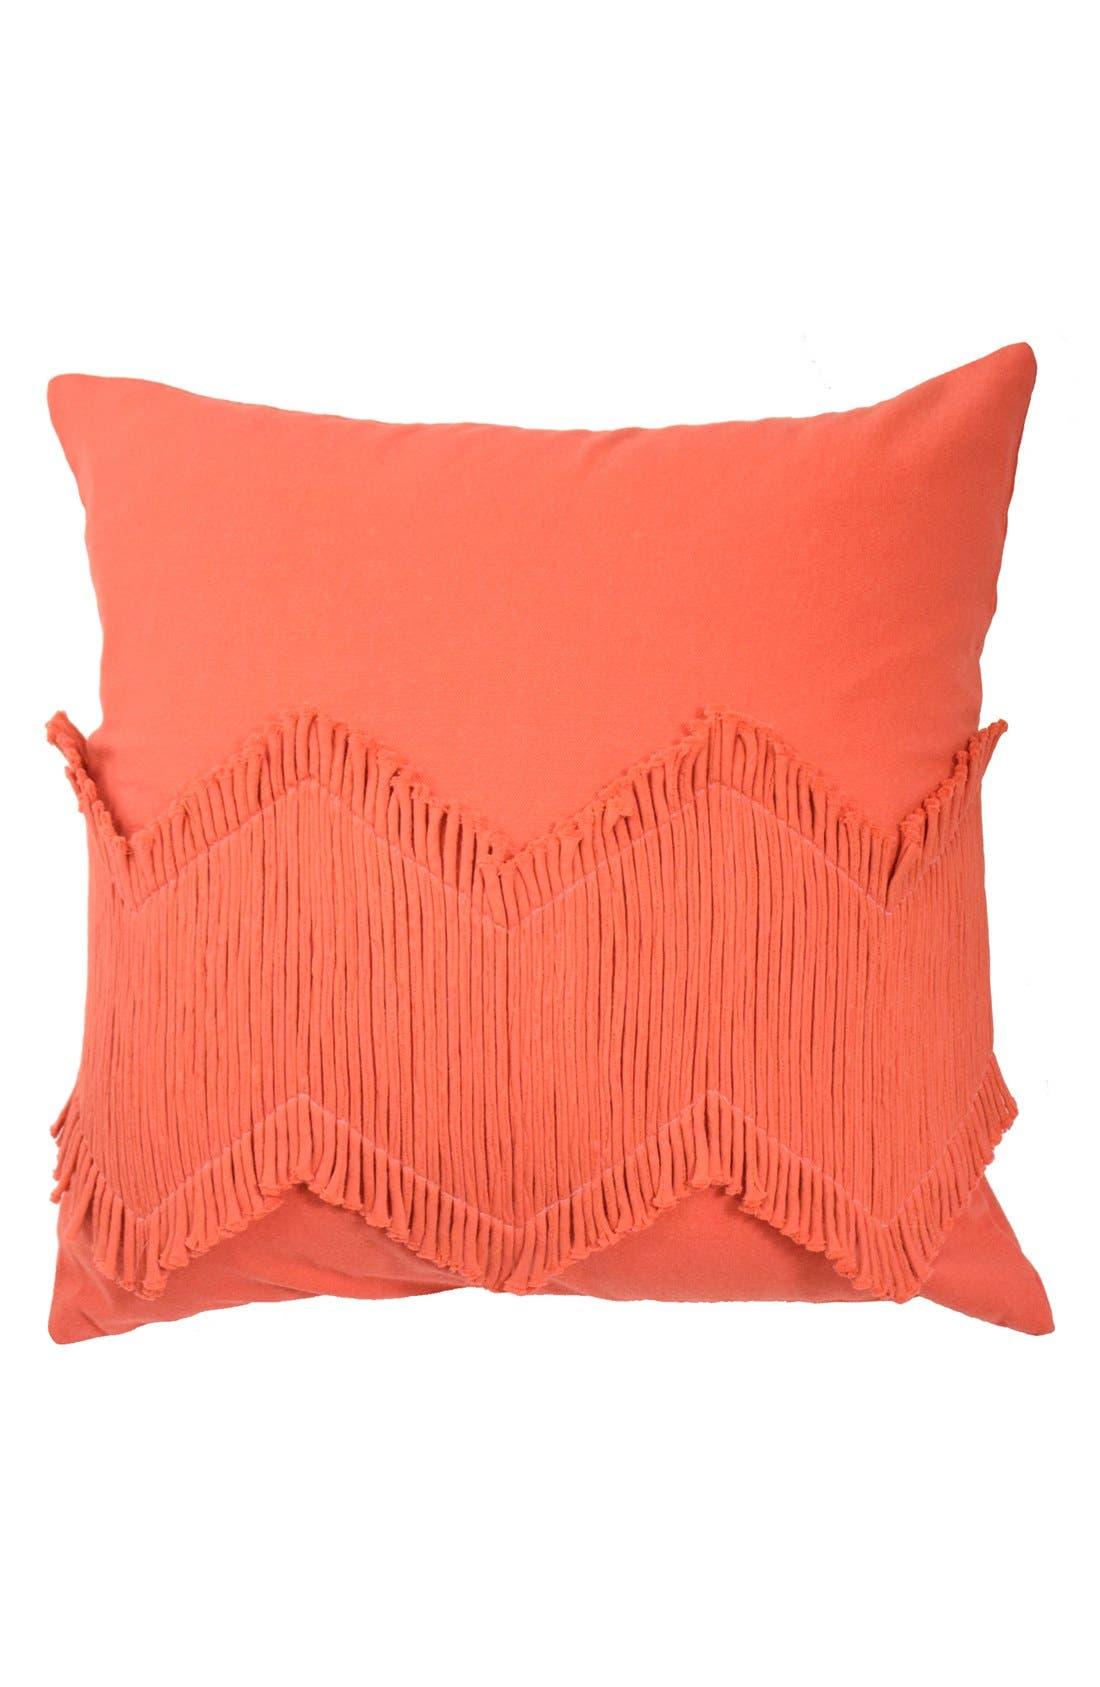 'Puebla' Pillow,                         Main,                         color, Orange